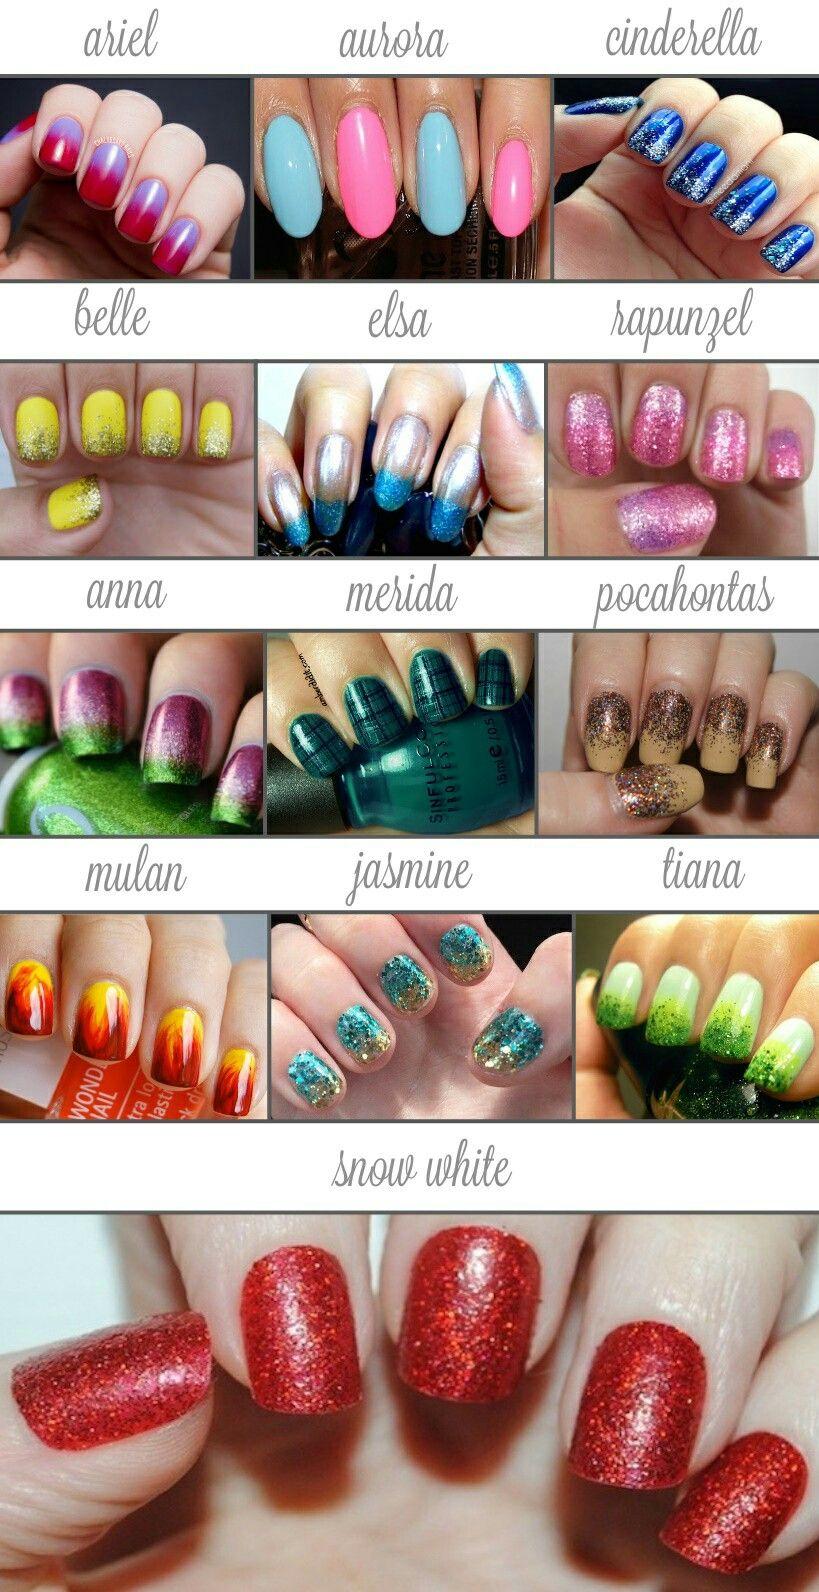 Simple Subtle Disney Princess Nails - Nail Art | Claws | Pinterest ...